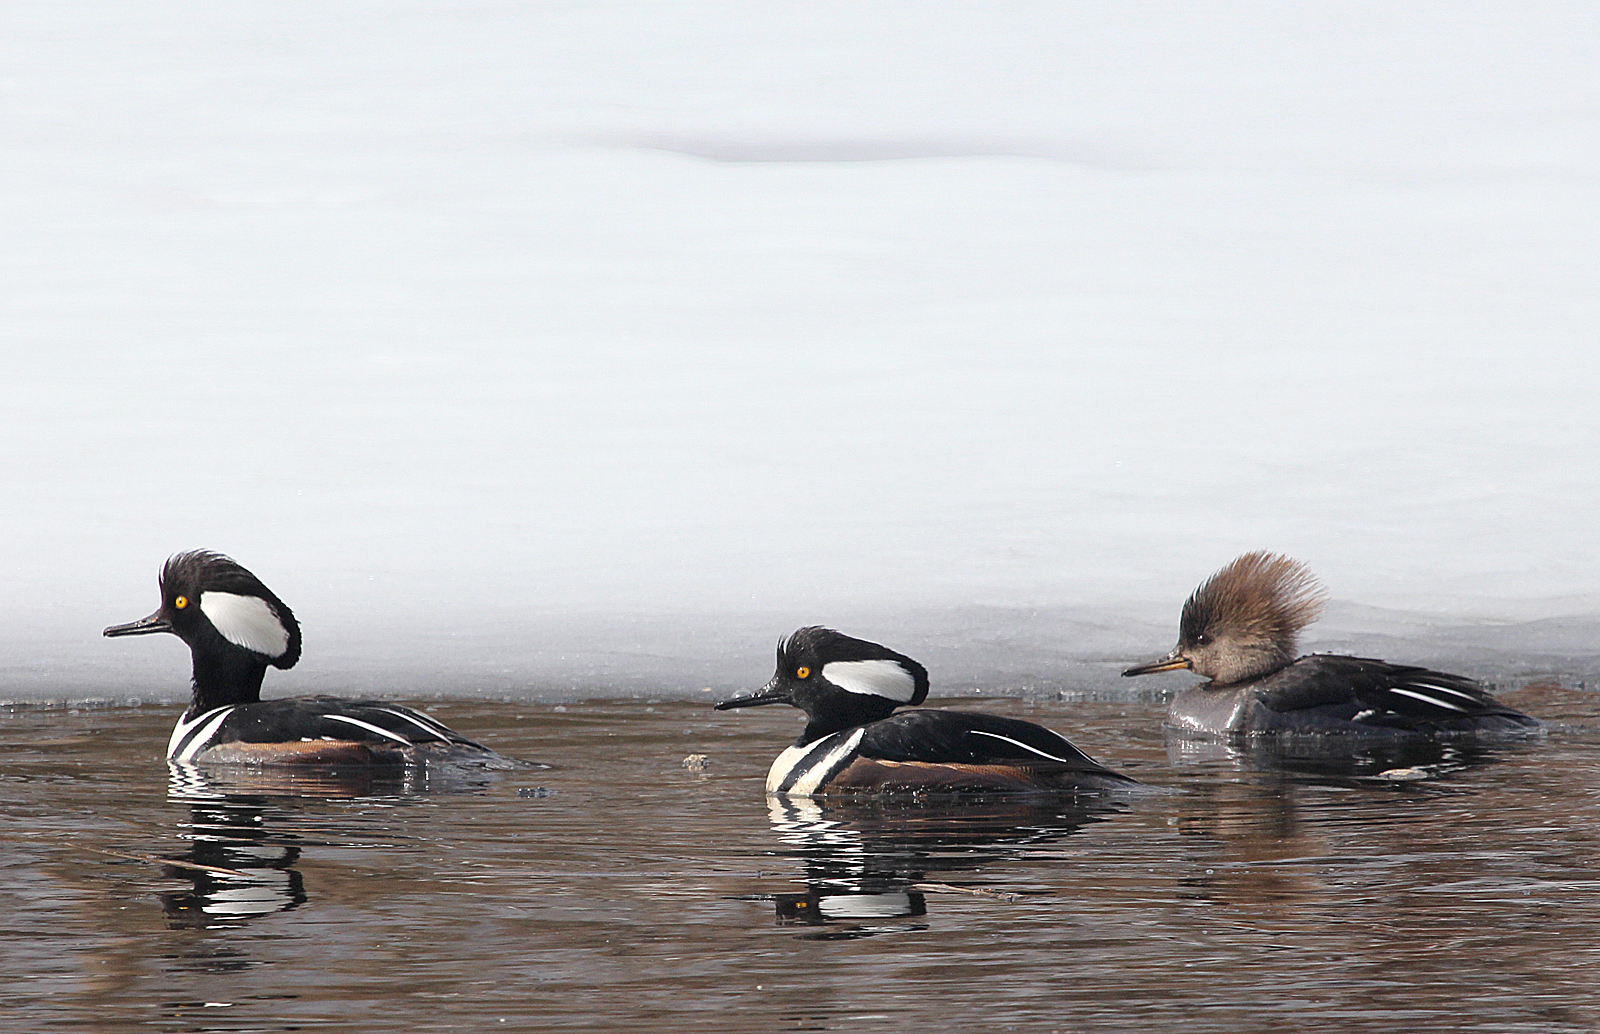 Photo by Chris Bosak Hooded Mergansers swim in a small unfrozen section of water at Selleck's/Dunlap in Darien, Conn., in Feb. 2014.